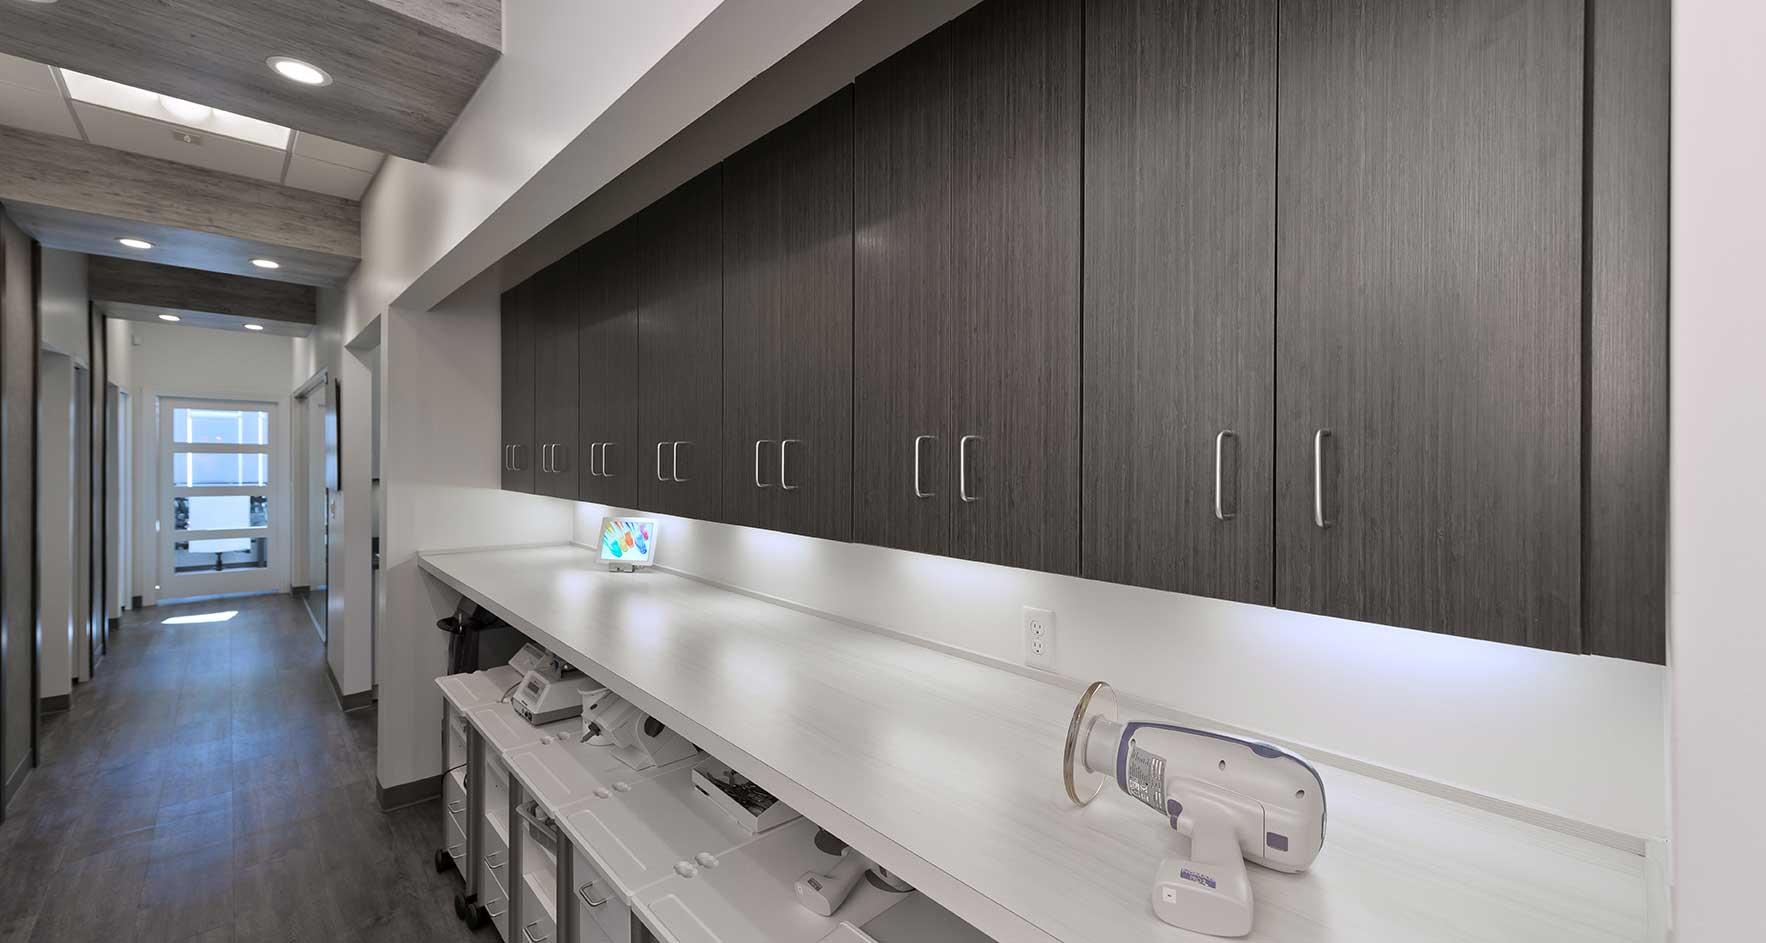 NJ Laser Dentistry | Cart Storage | Overhead Cabinets